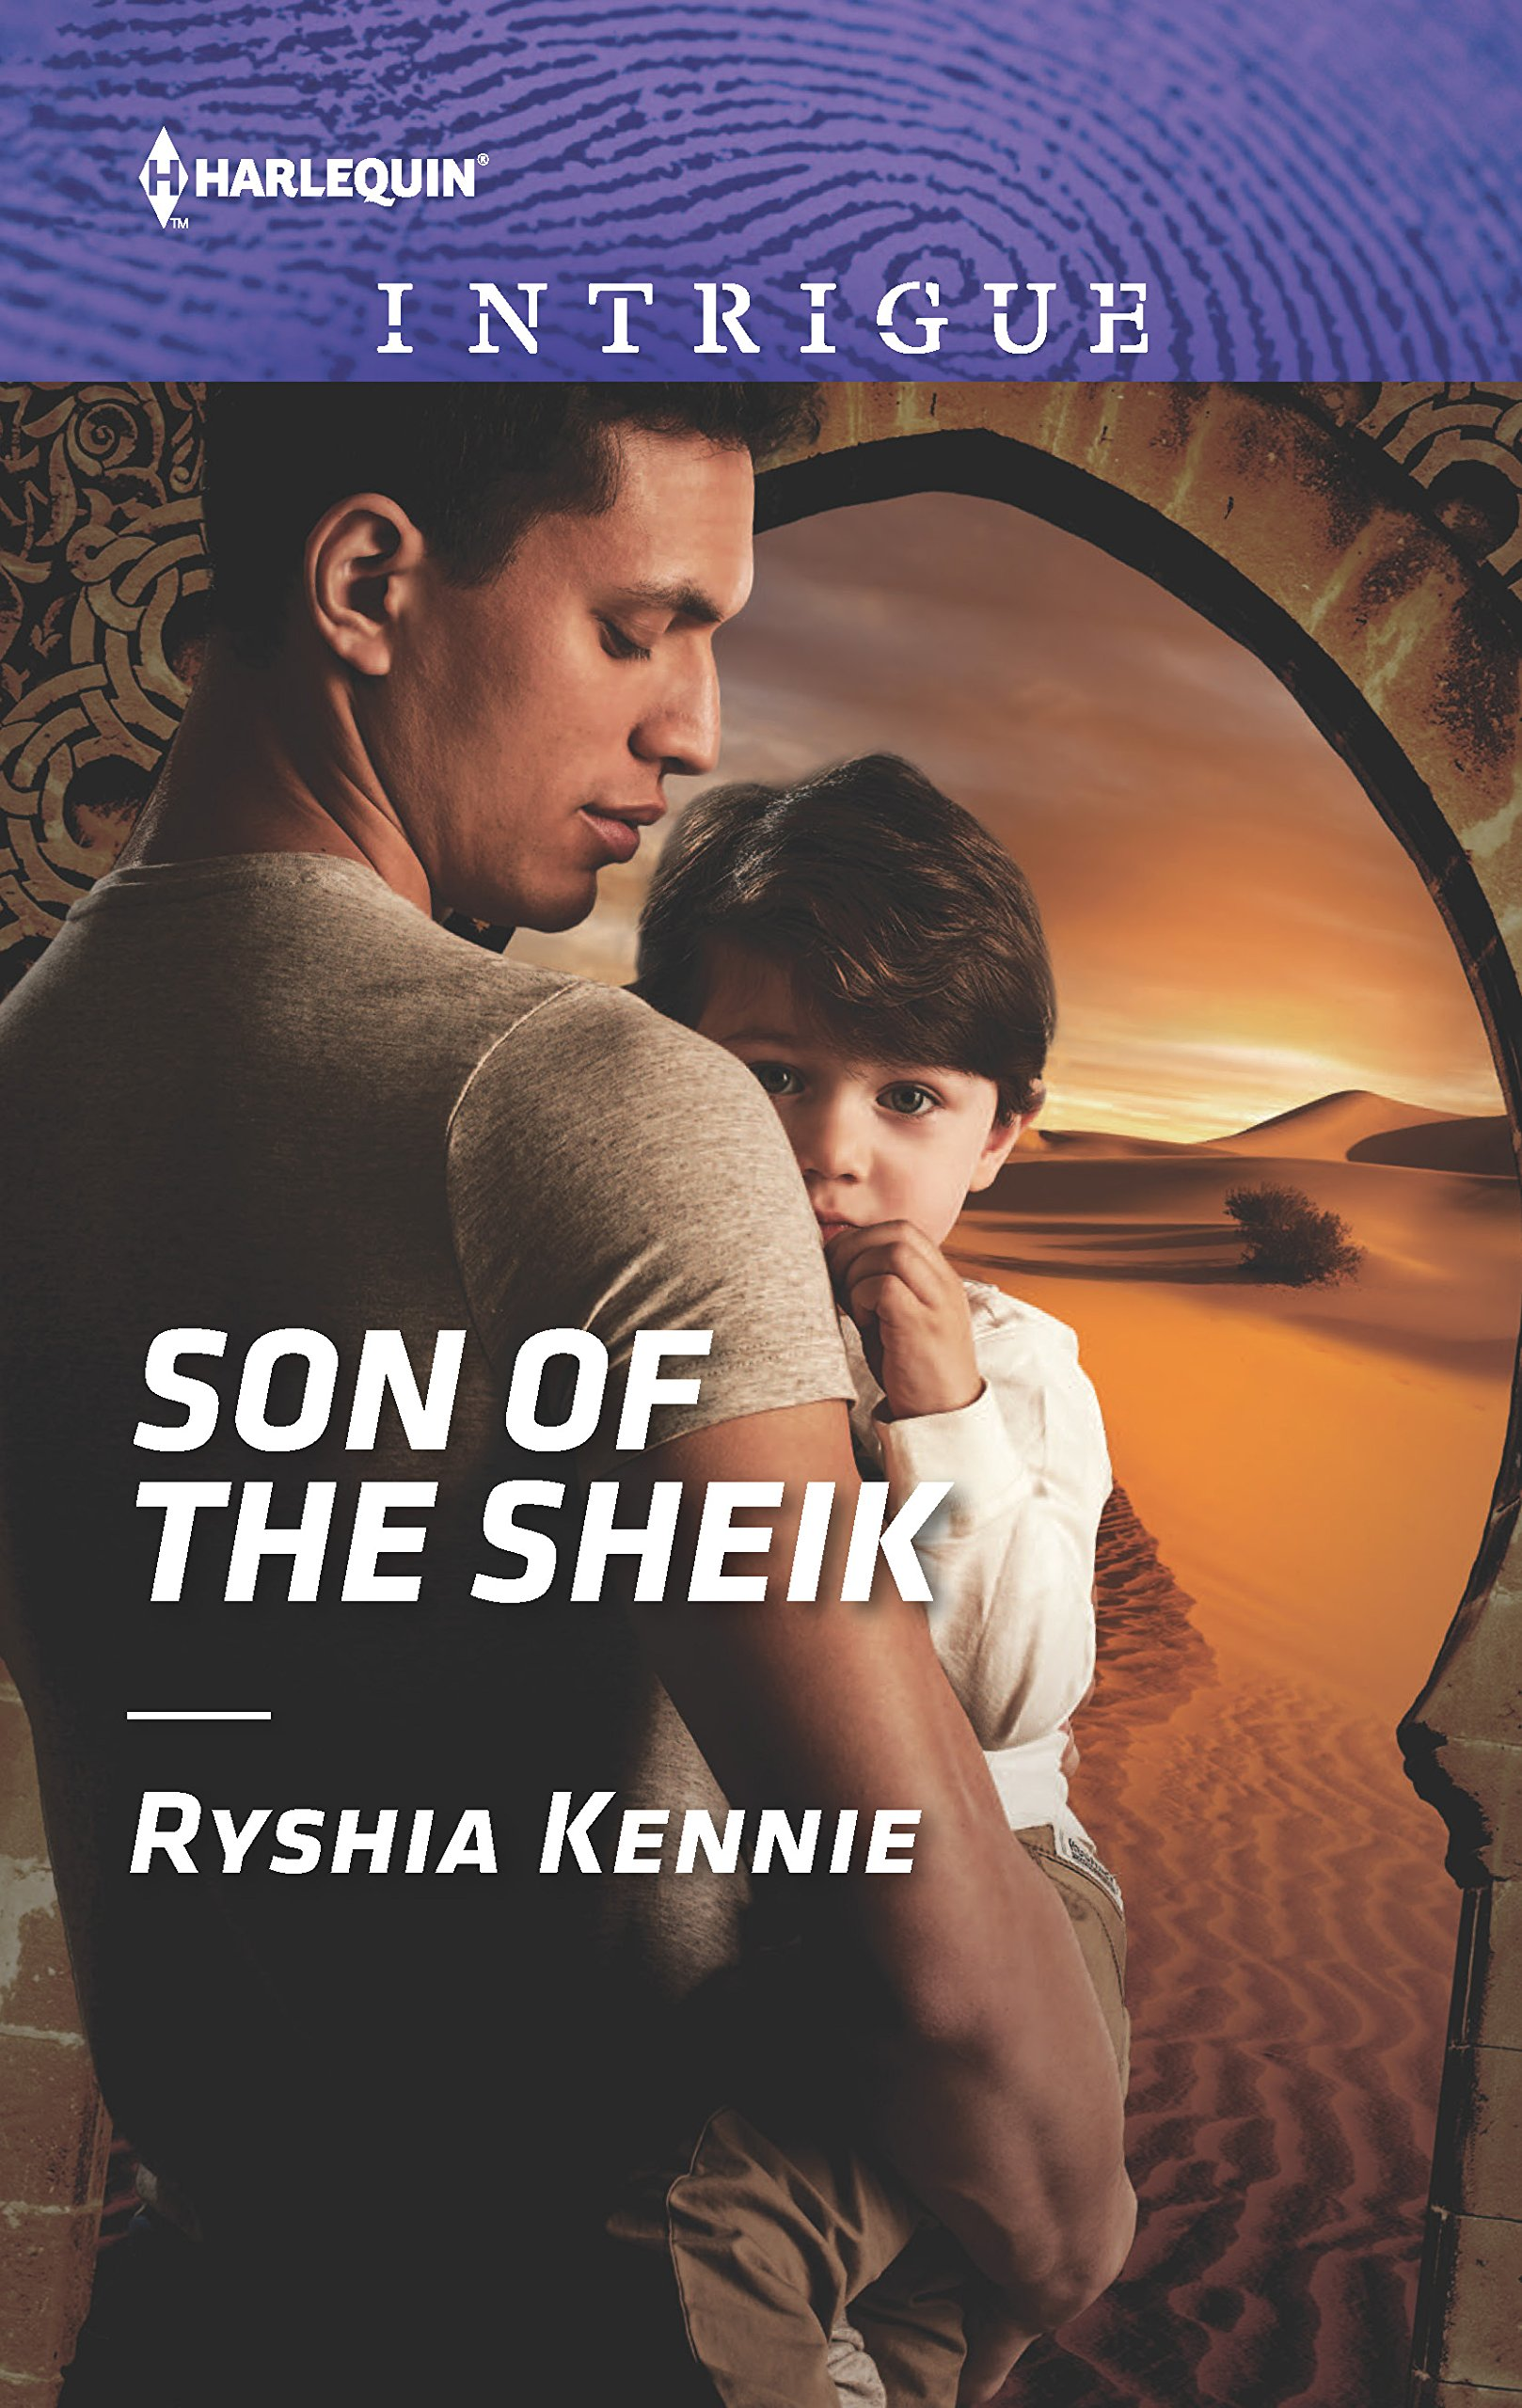 Amazon.com: Son of the Sheik (Desert Justice) (9781335721068): Ryshia  Kennie: Books